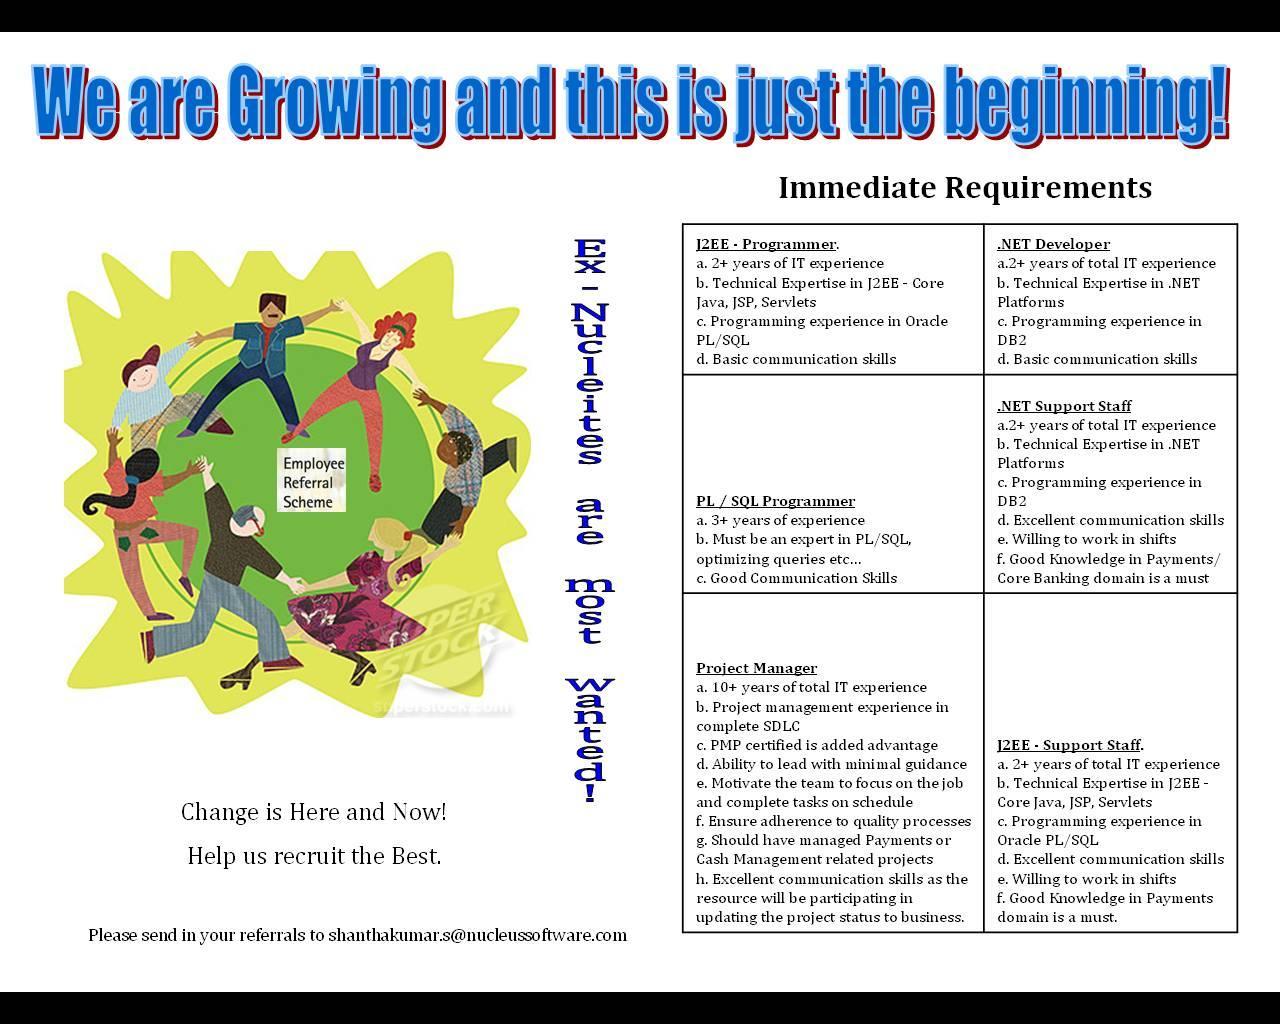 Friends Job Information: 07/01/2010 - 08/01/2010